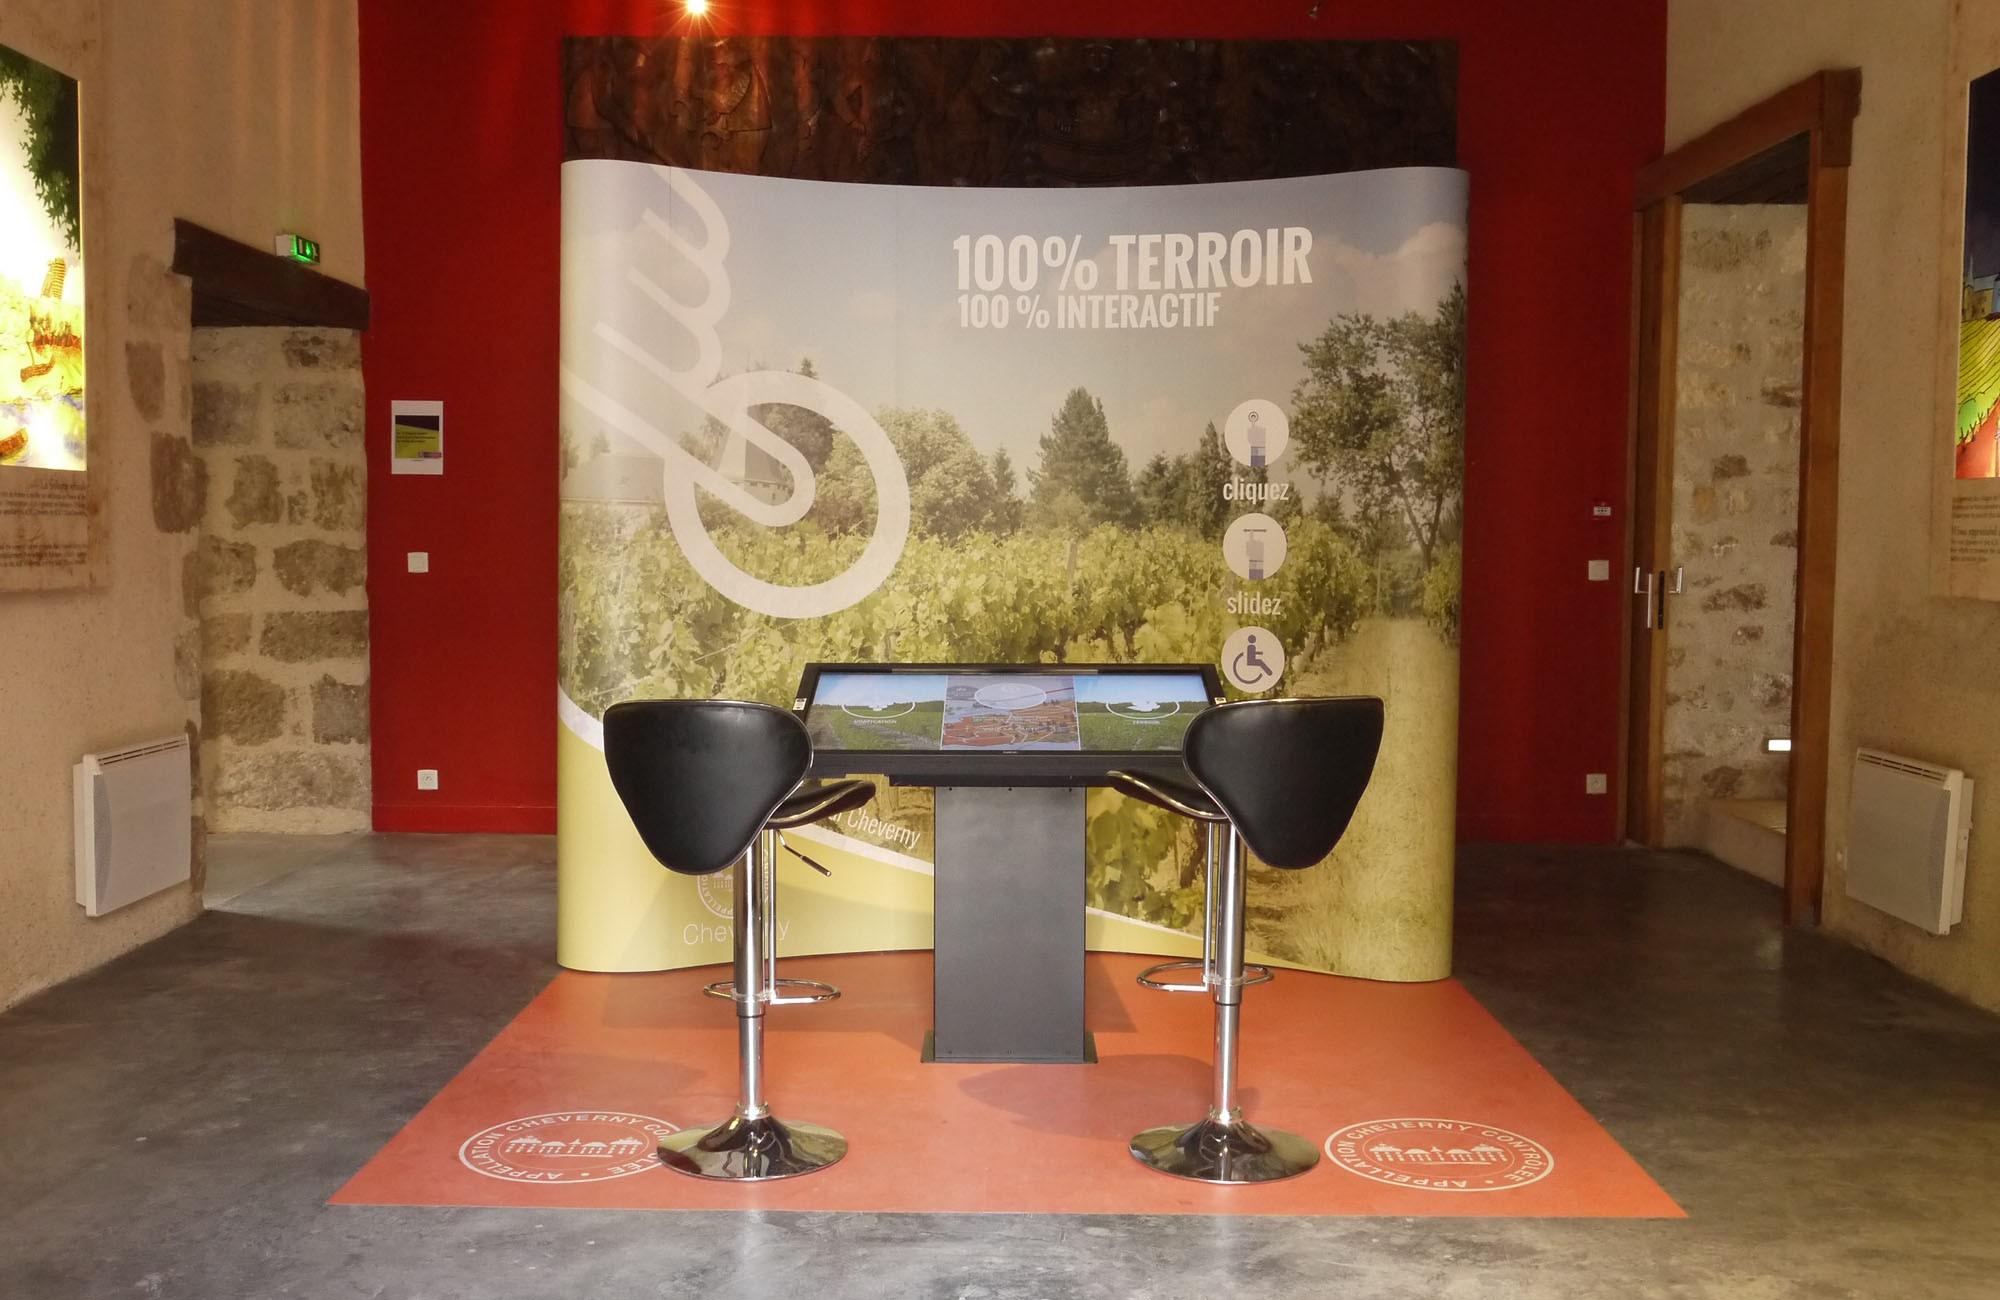 Venez visiter notre salle interactive !